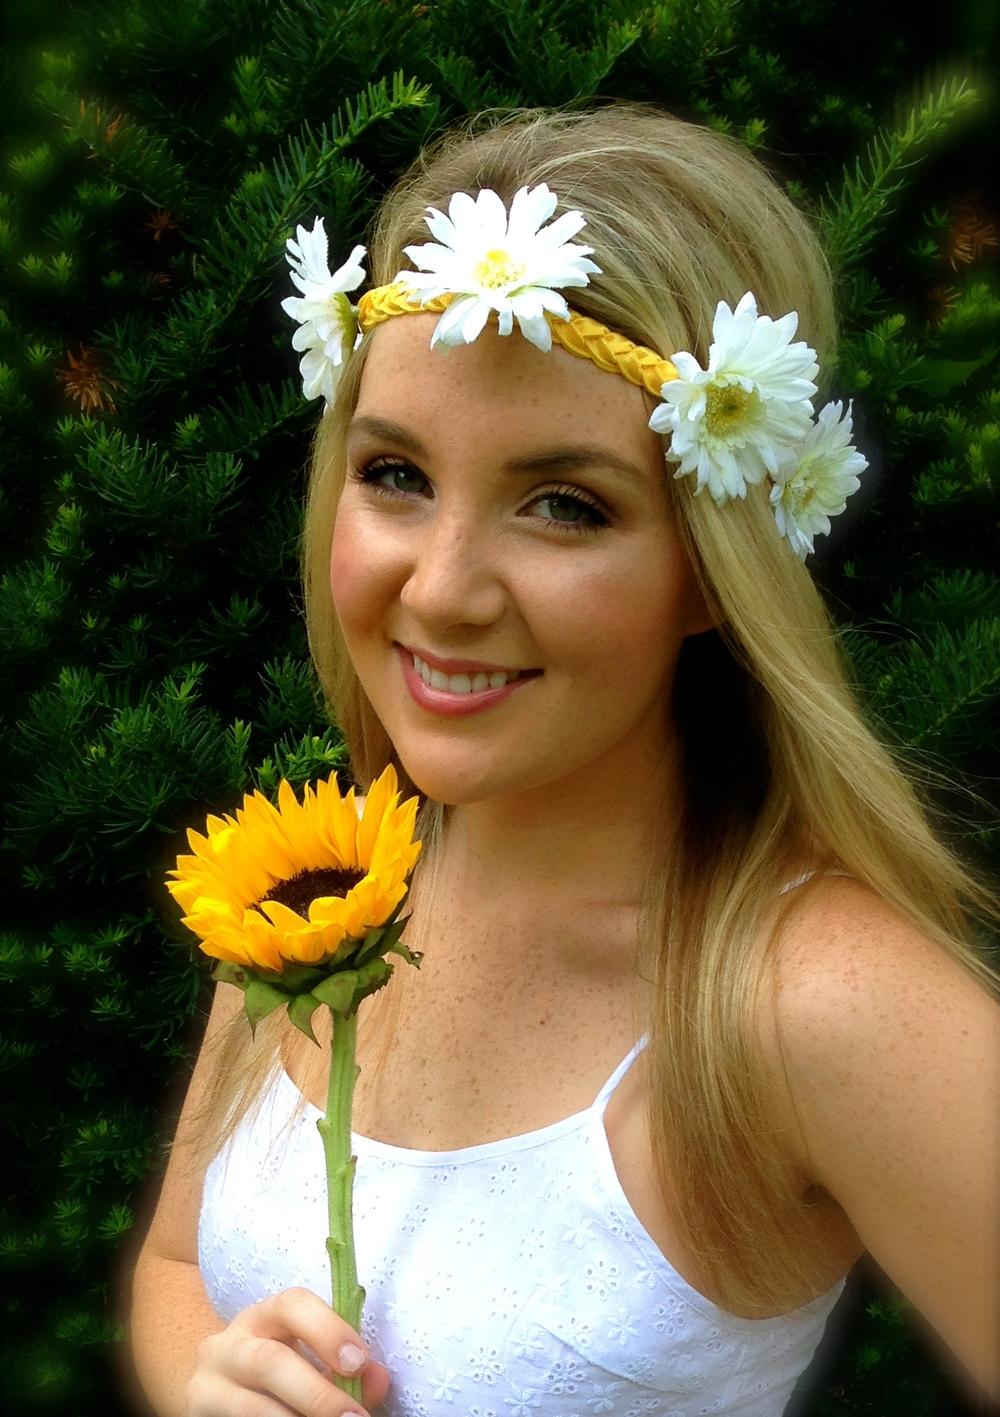 Haybands' White Daisy Flower JuJu Haylo in Yellow